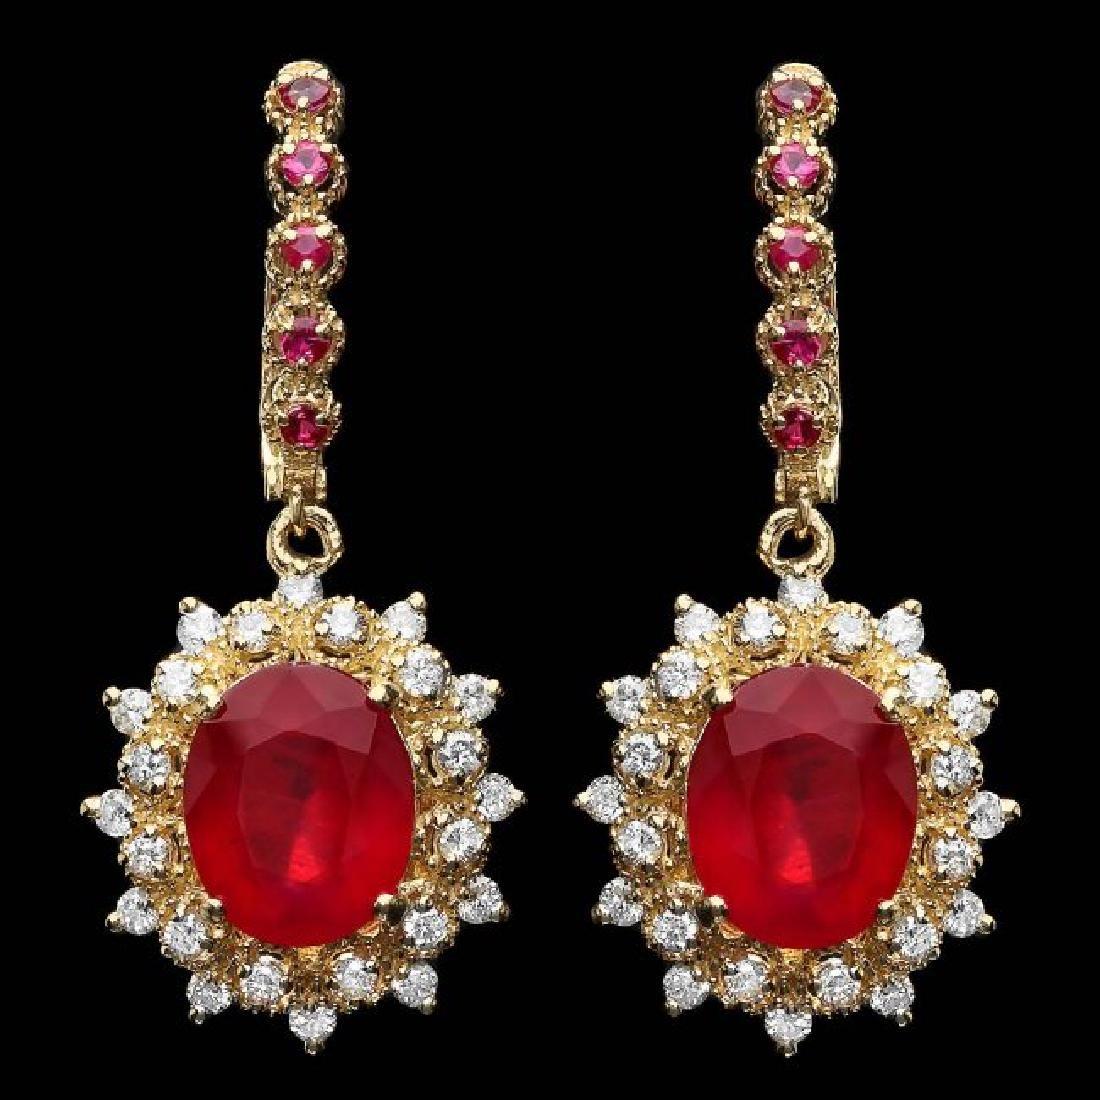 14k Gold 11.00ct Ruby 1.30ct Diamond Earrings